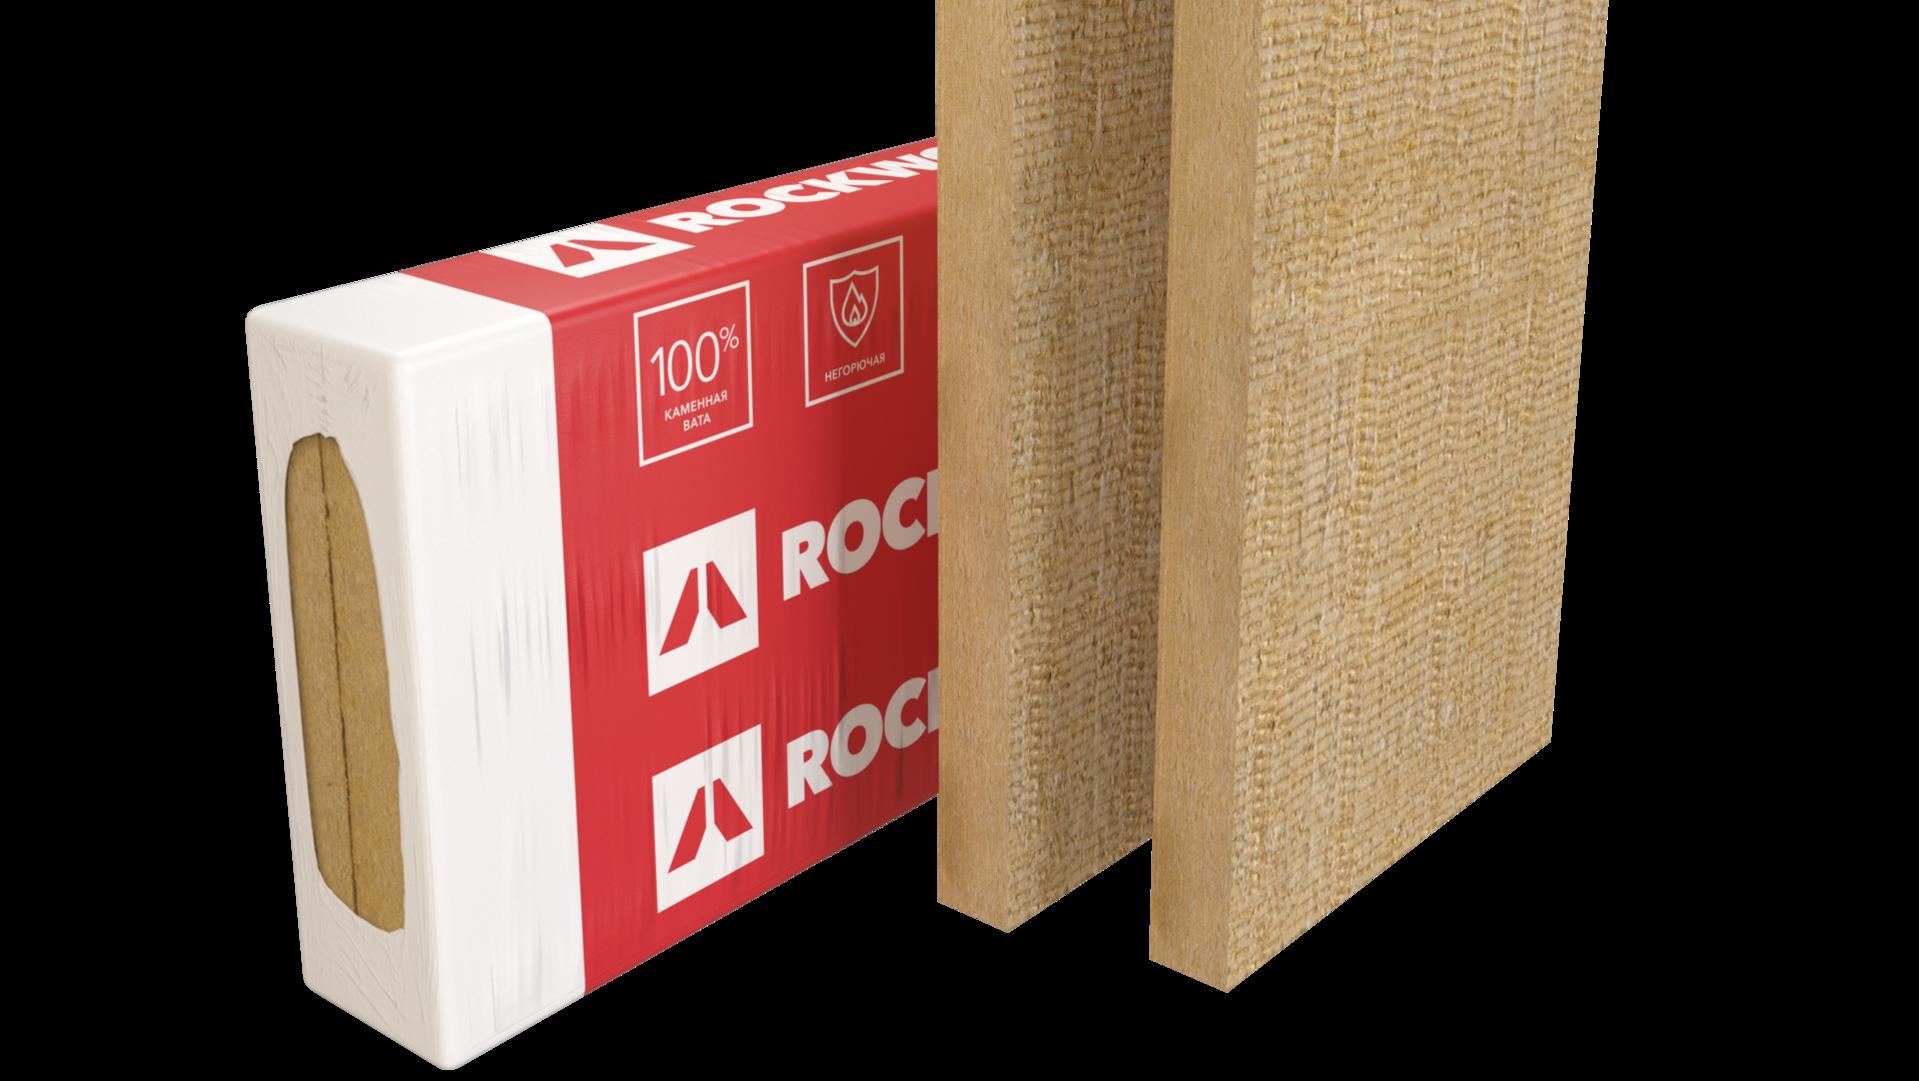 package, product, facade batts balkon, mats, rockfacade